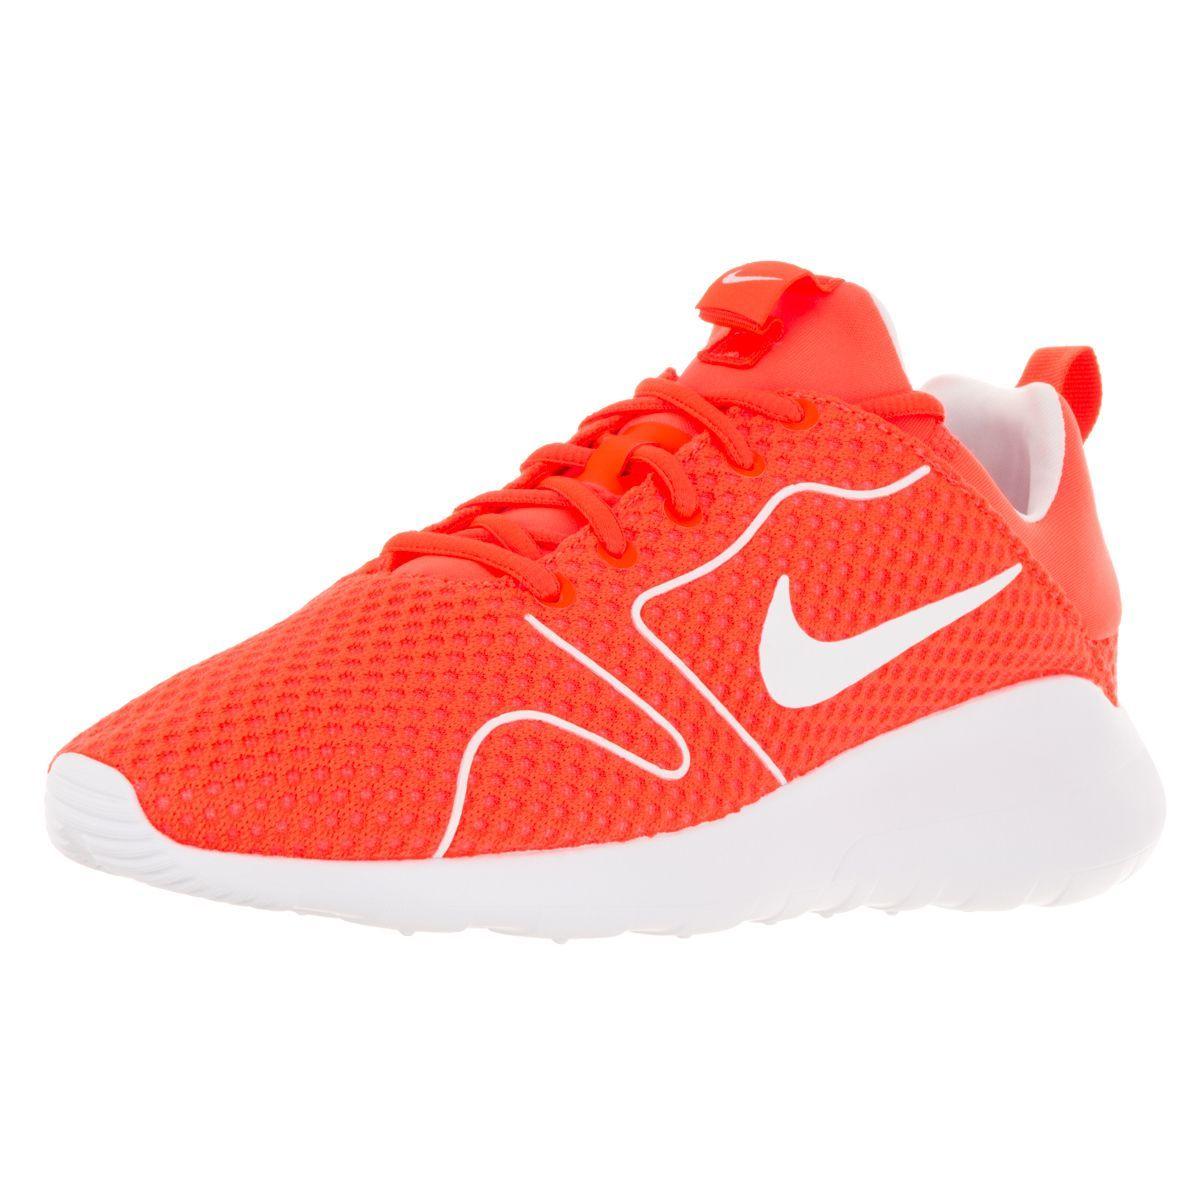 new concept 39e84 32c71 ... ebay nike mens kaishi 2.0 br total crimson white running shoes e7413  8b0f8